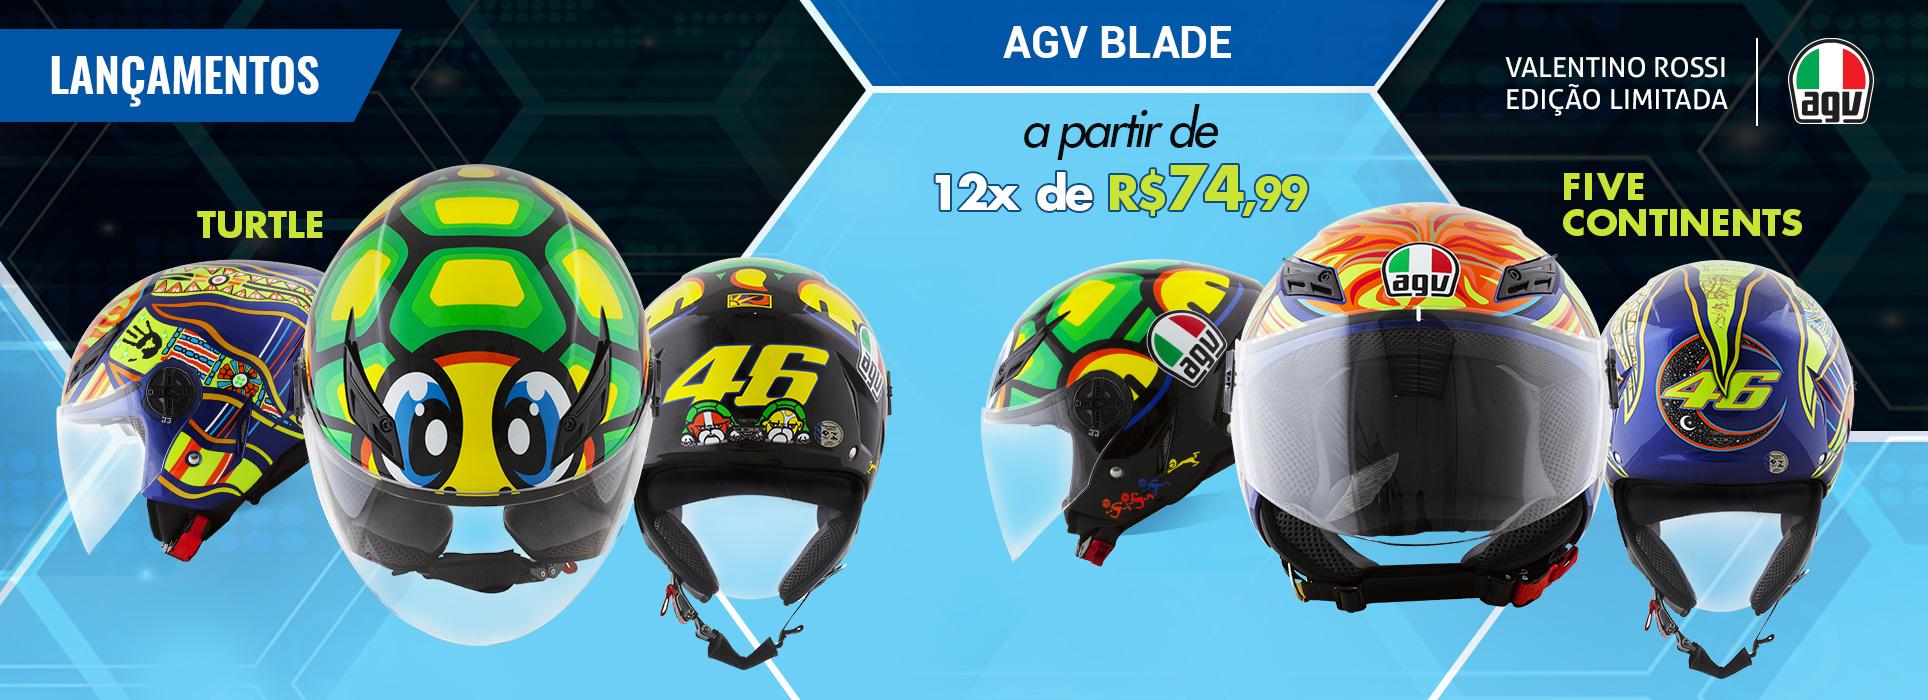 agv-blade